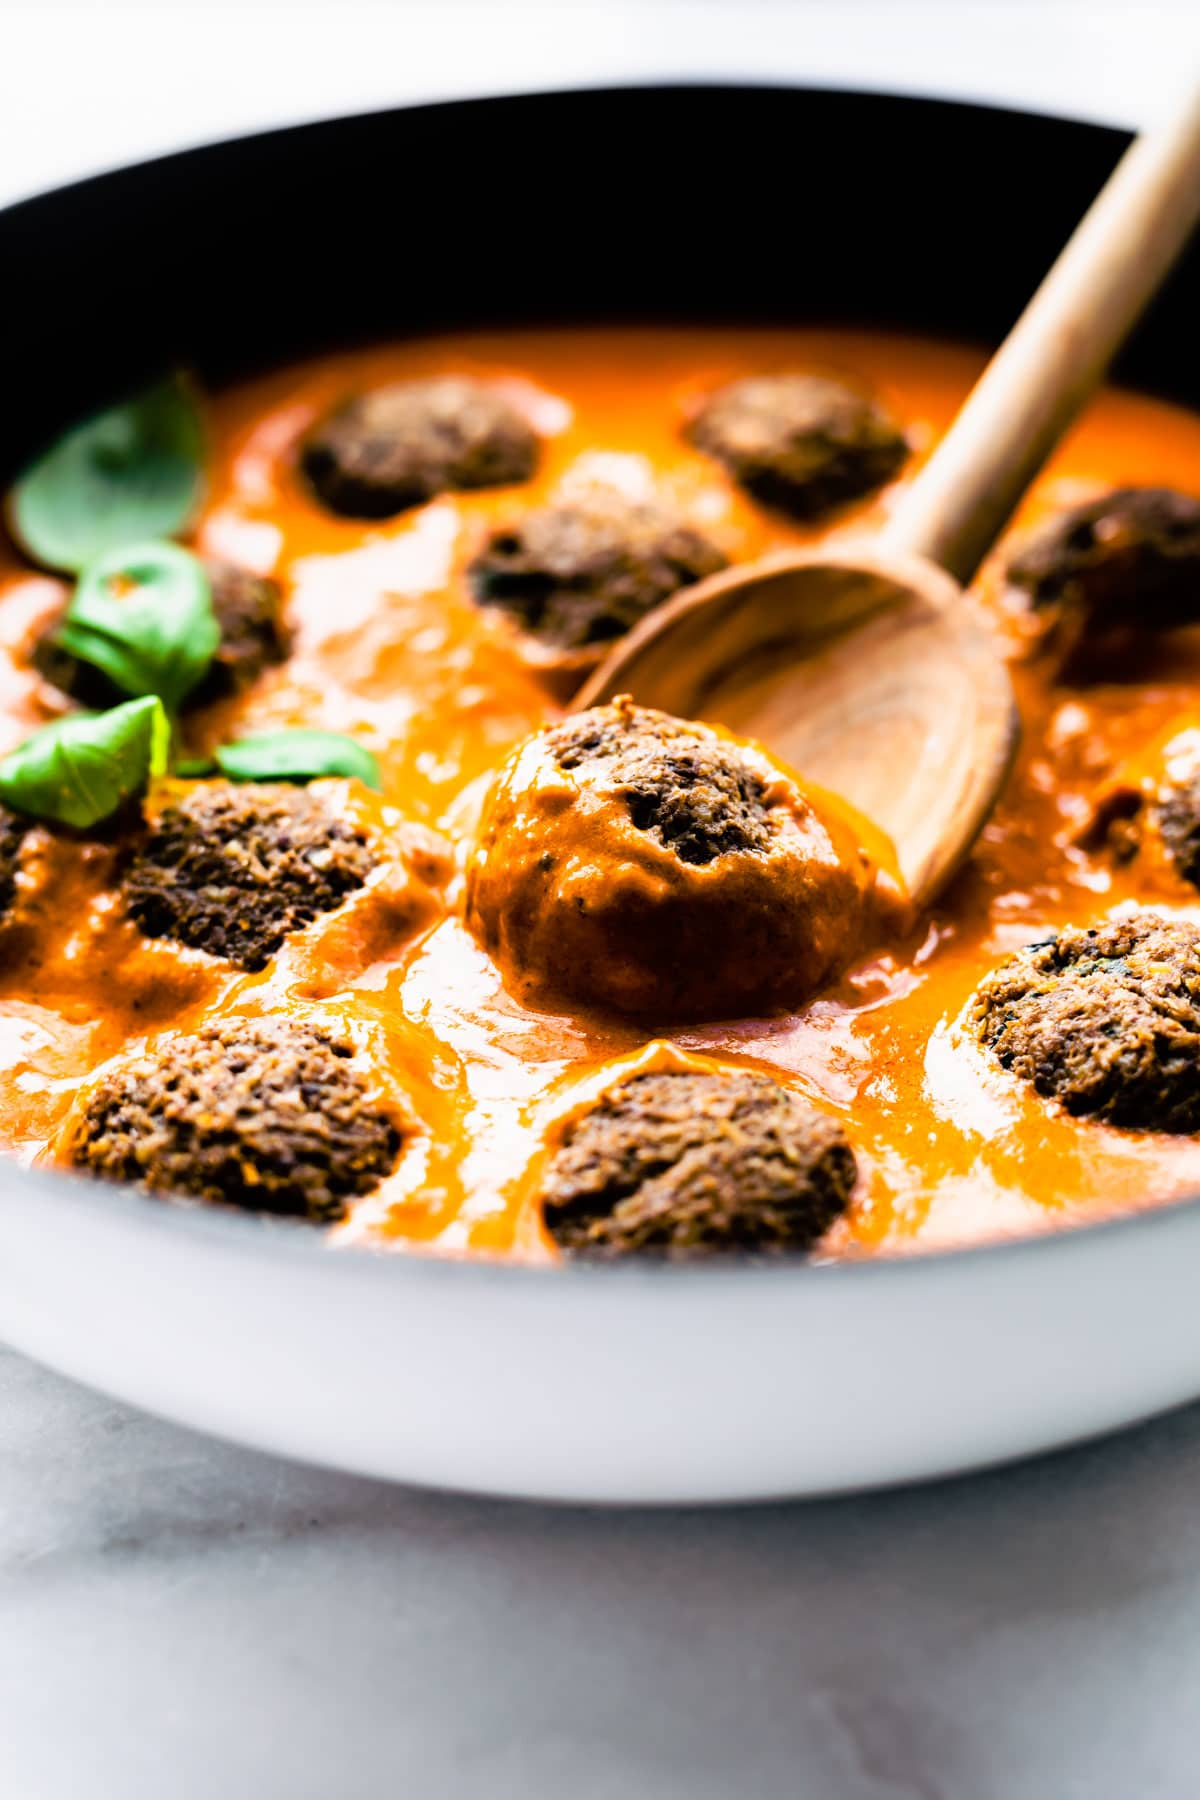 close up: vegan mushroom meatballs in skillet of orange colored pasta sauce